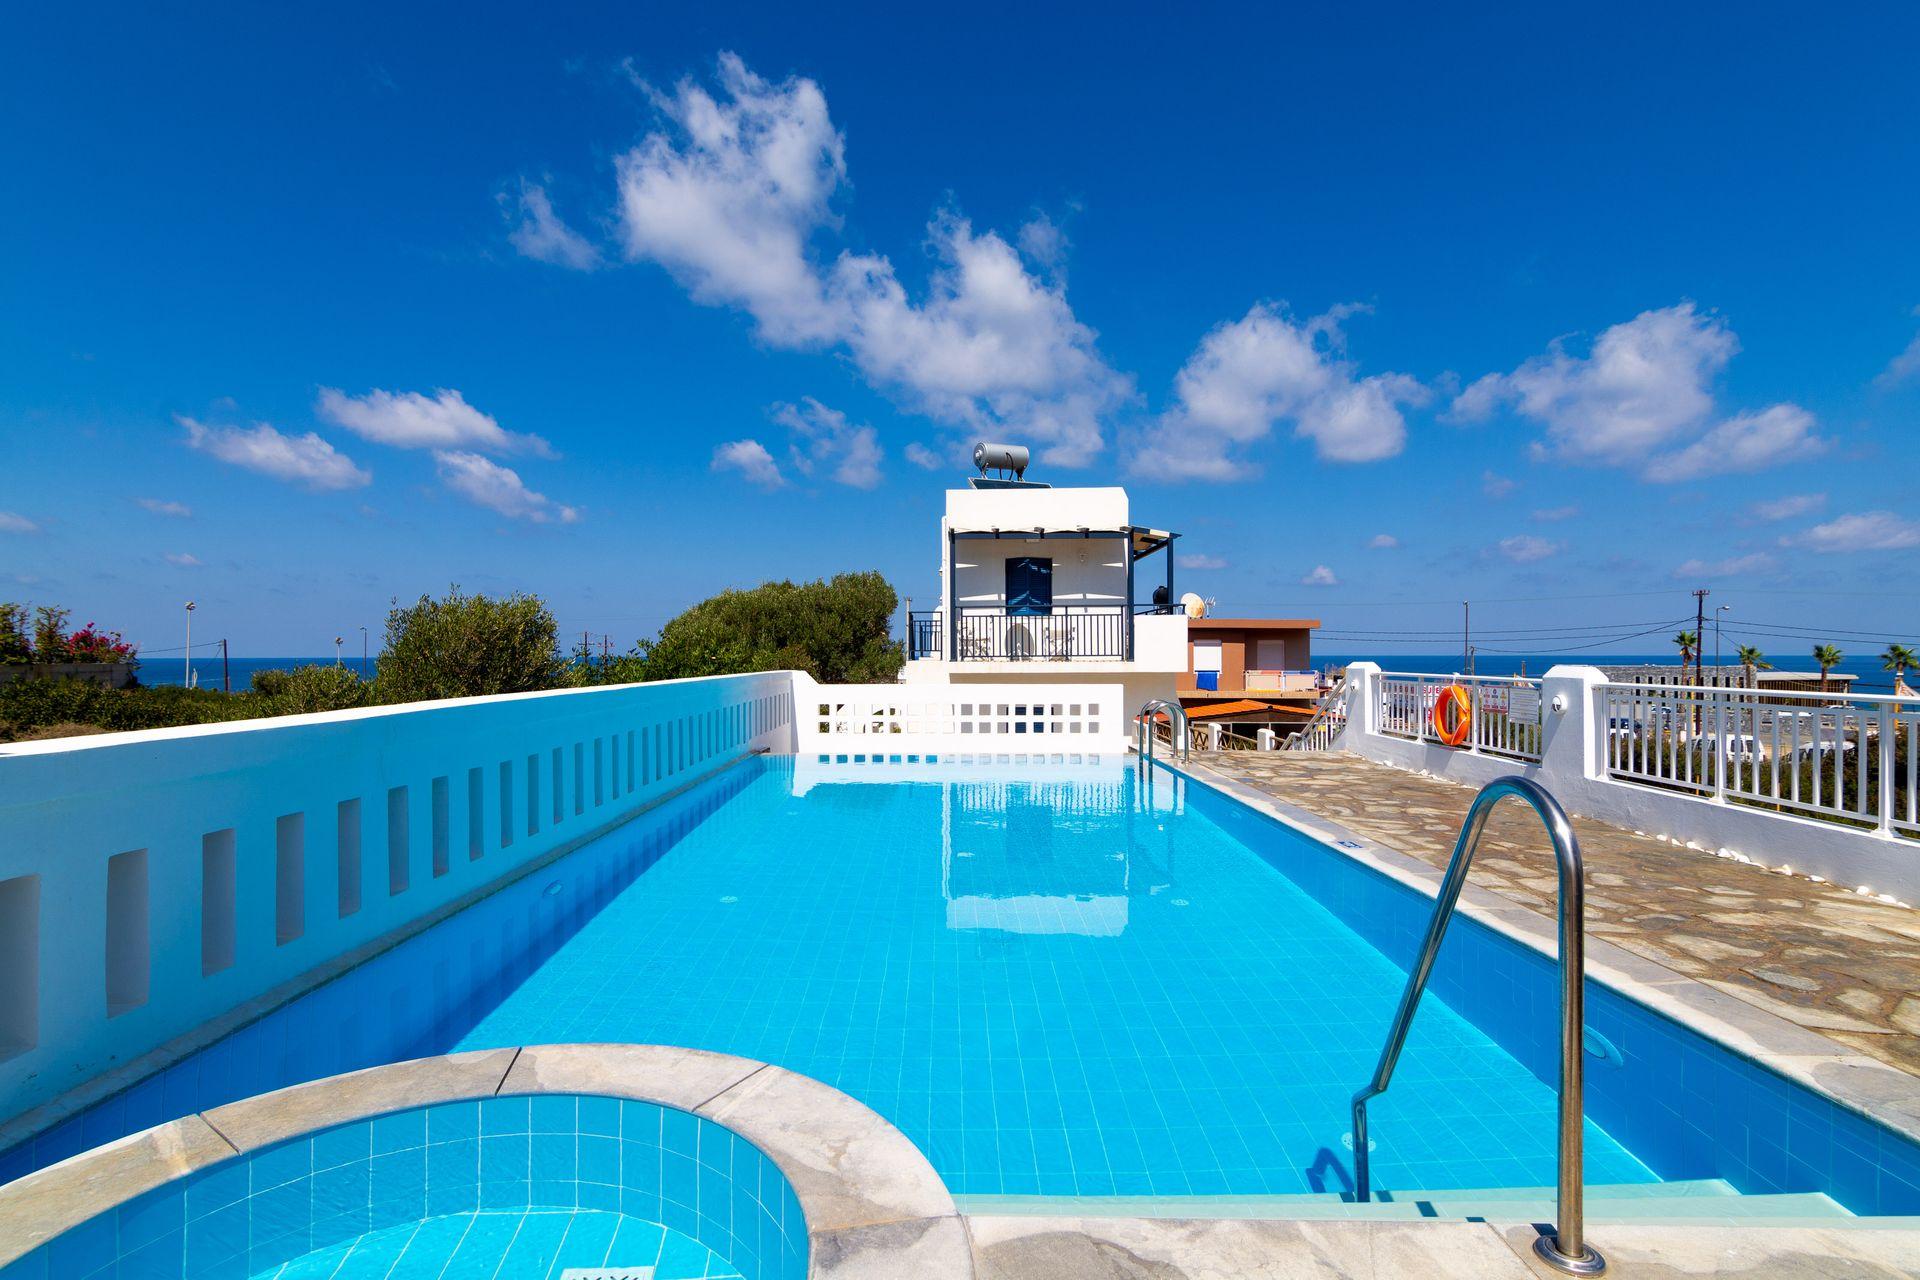 Okirroi Villas Crete - Σταλιδα, Ηράκλειο ✦ -22% ✦ 2